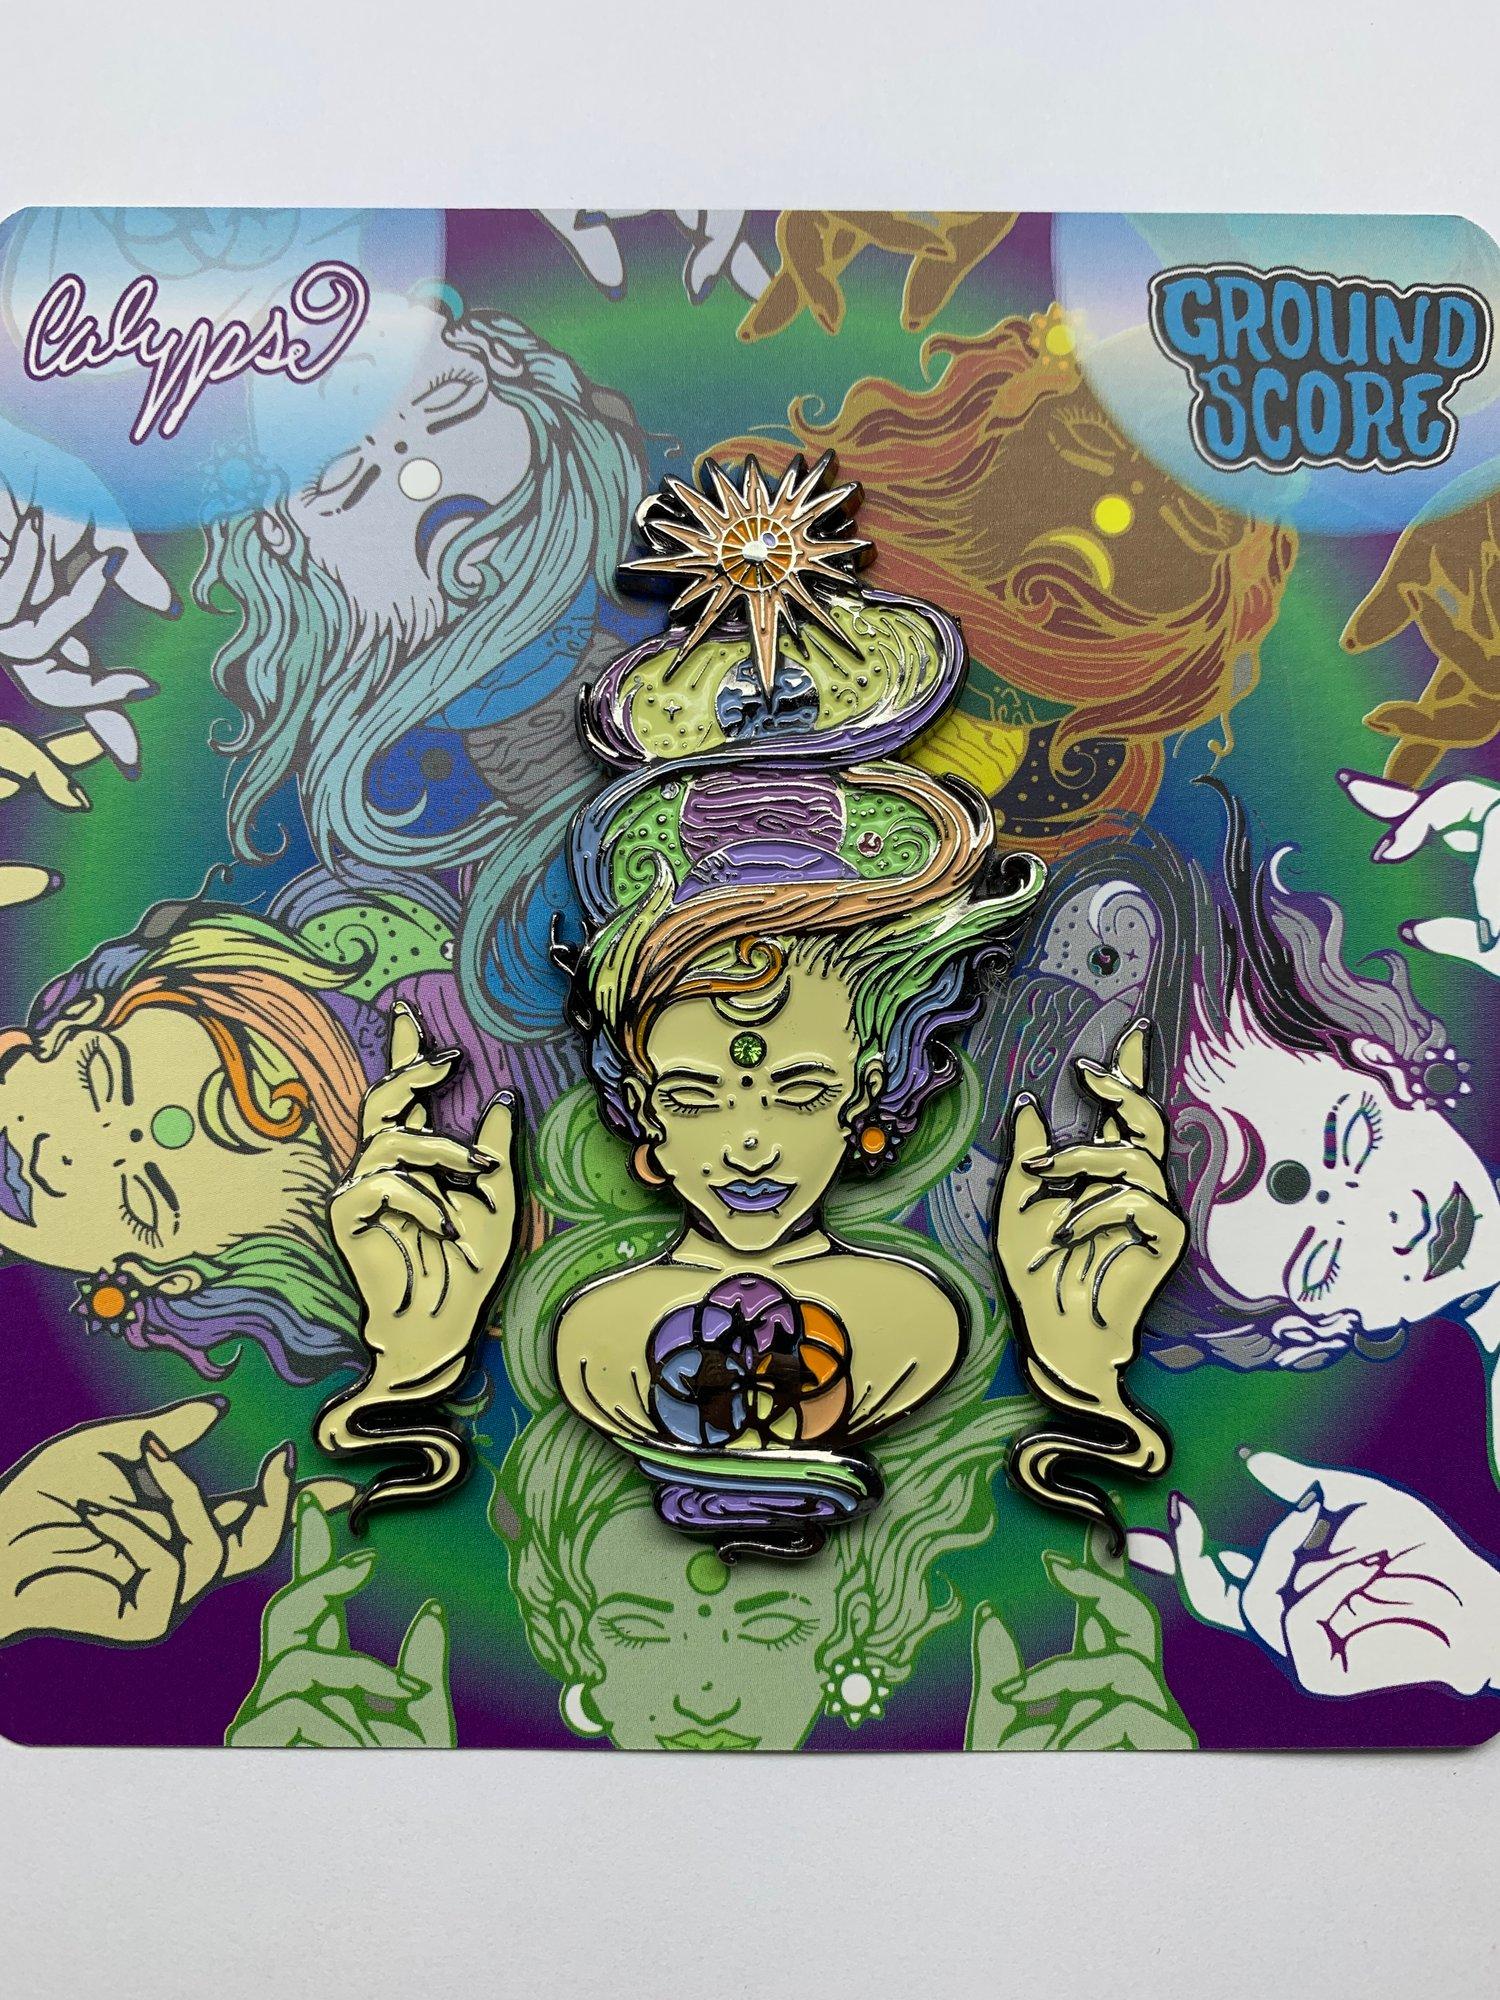 Calypso - Harmonic Headspace (OG - LE 25)